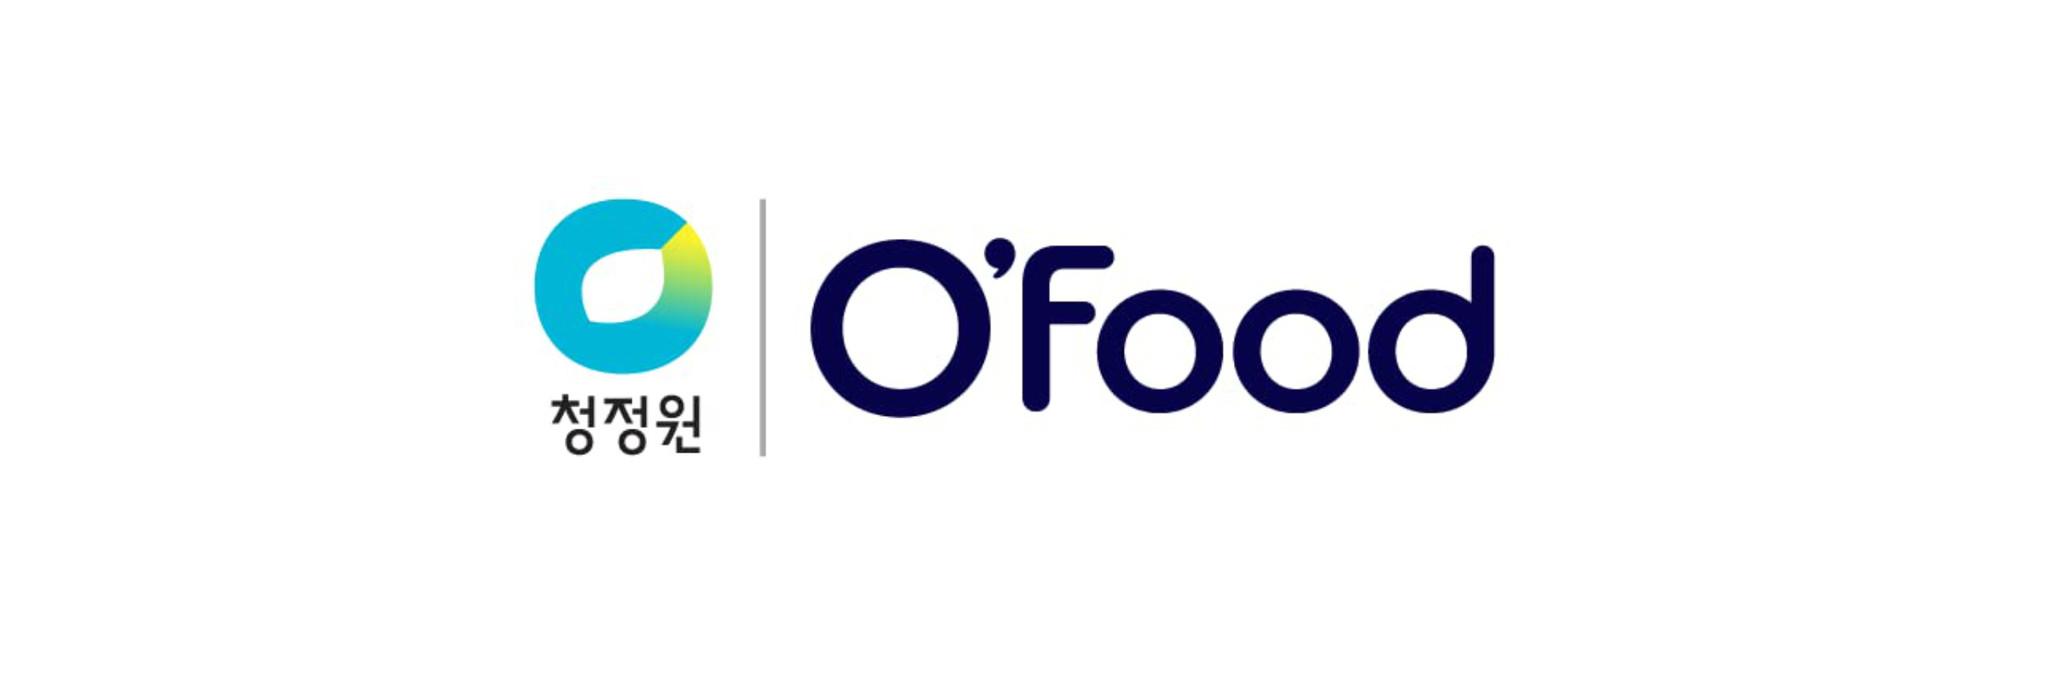 O'FOOD